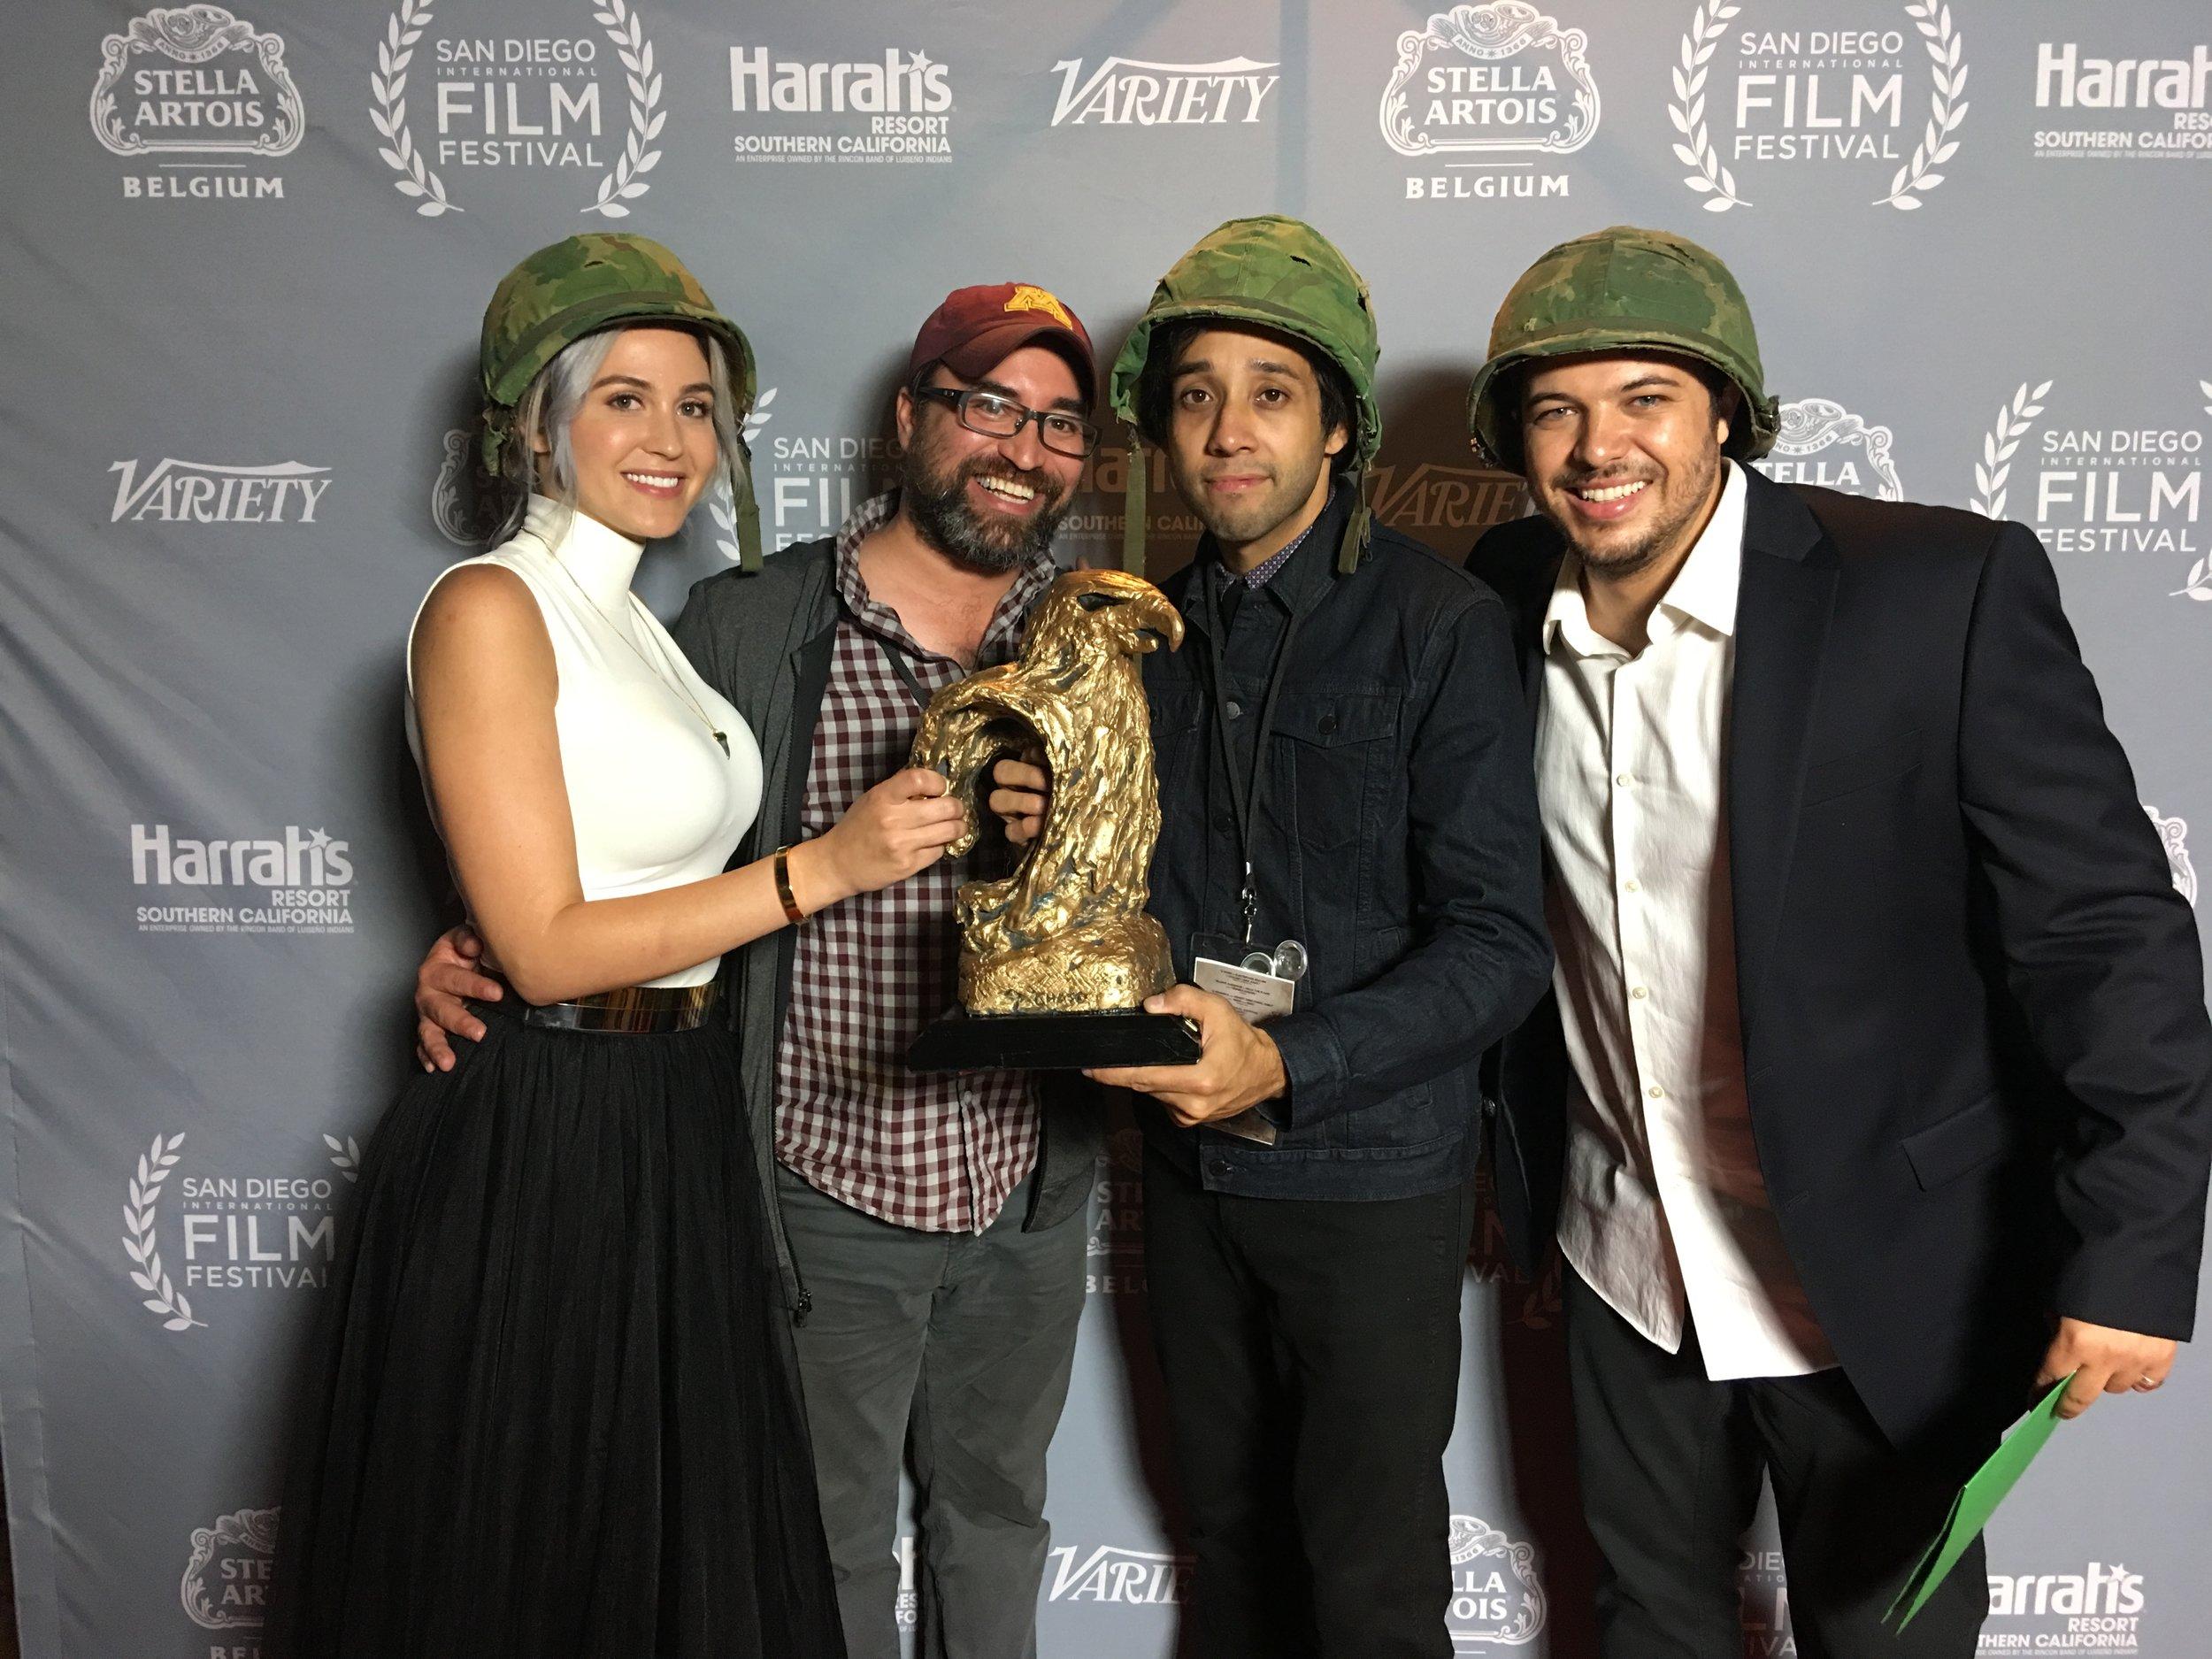 2016 San Diego International Film Festival Awards Ceremony. Mark Cartier with RAILWAY SPINE filmmakers Emily Trosclair, Samuel Gonzalez Jr., and Chris Lang.